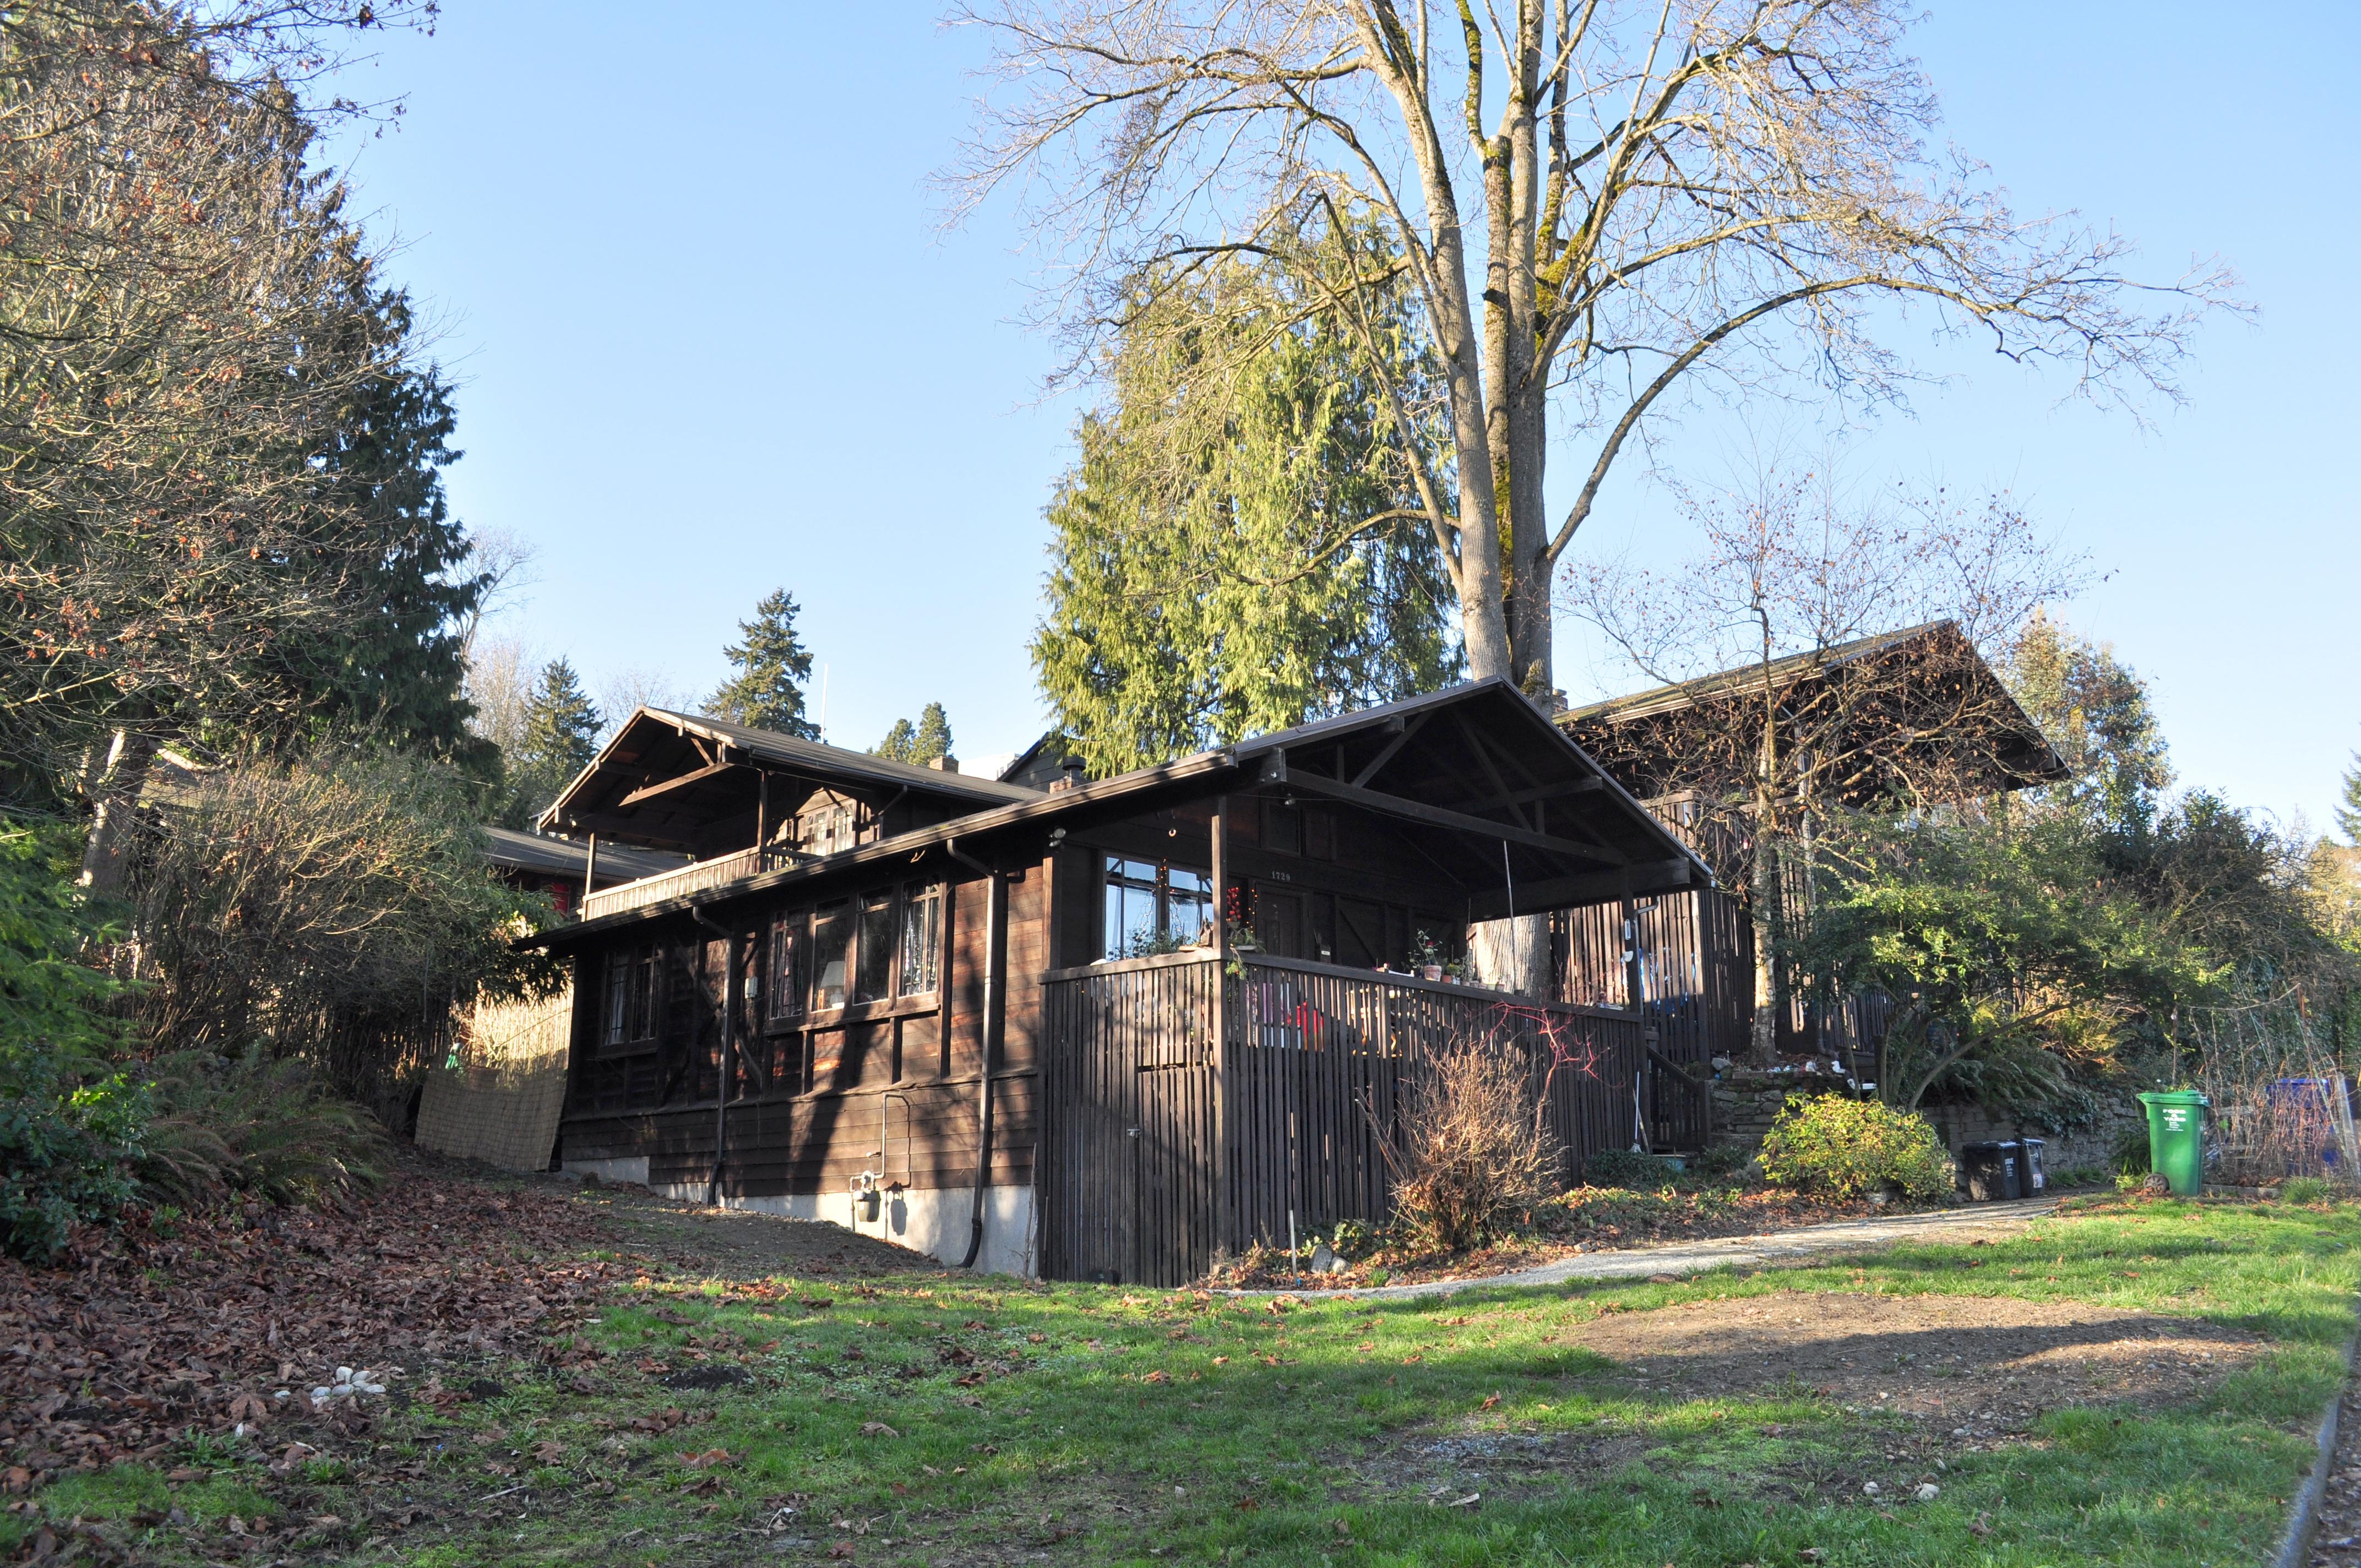 Ellsworth Storey Historic Cottage in modern day